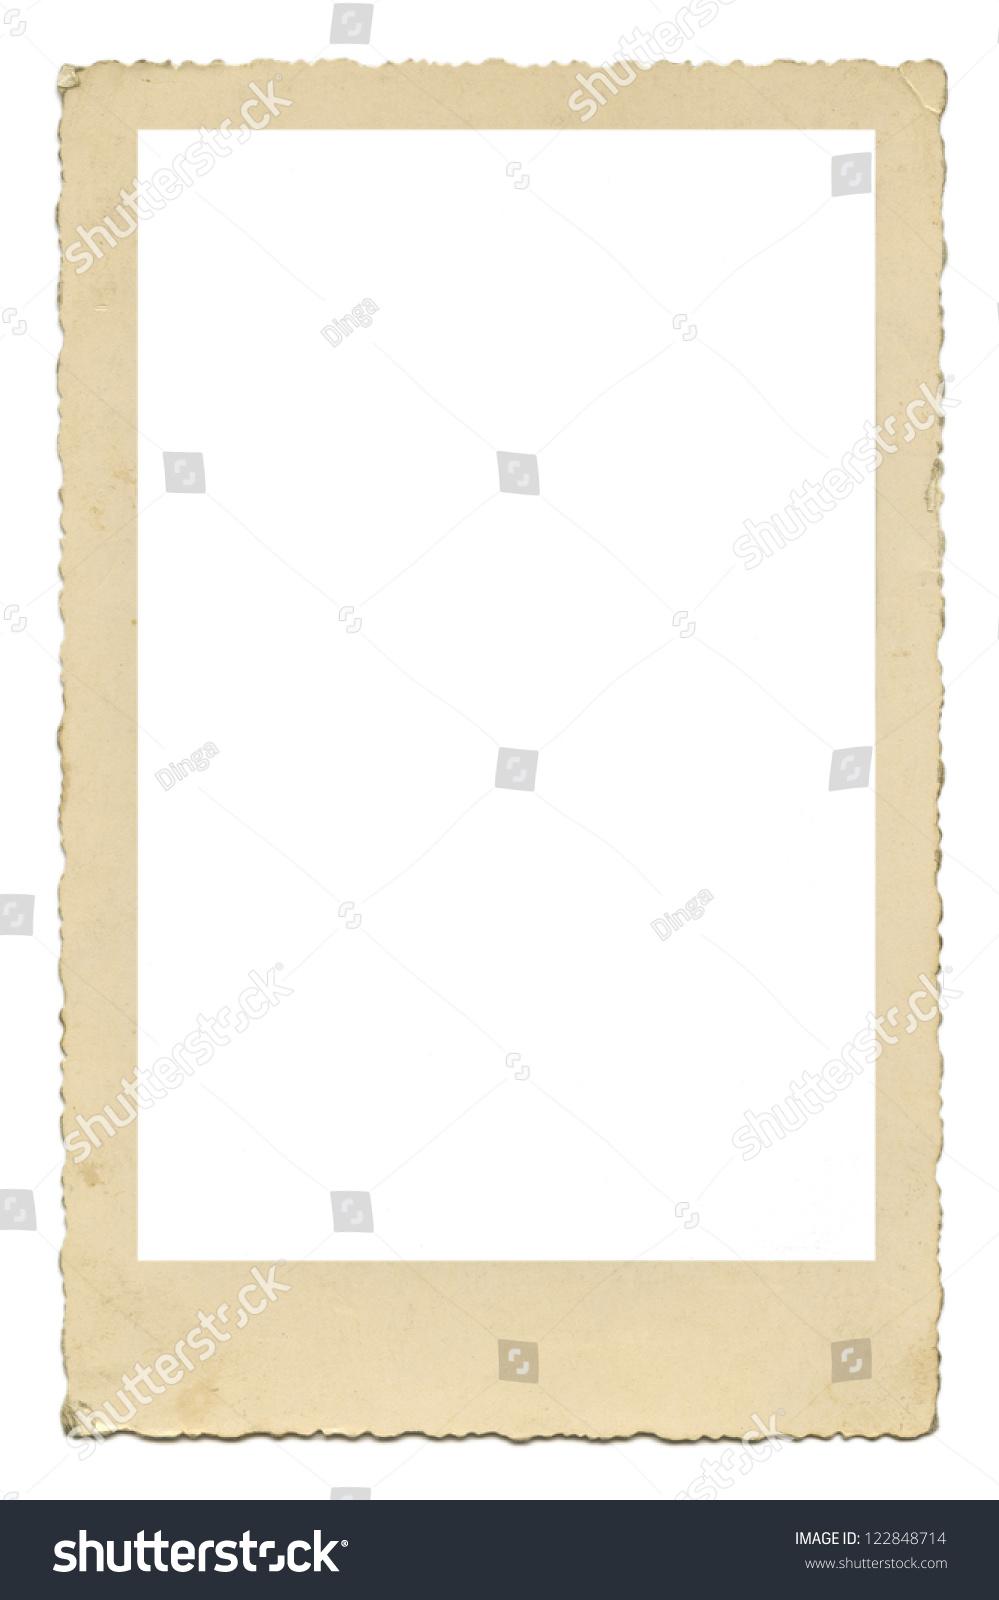 Blank Old Photo Frame Figured Edges Stock Photo 122848714